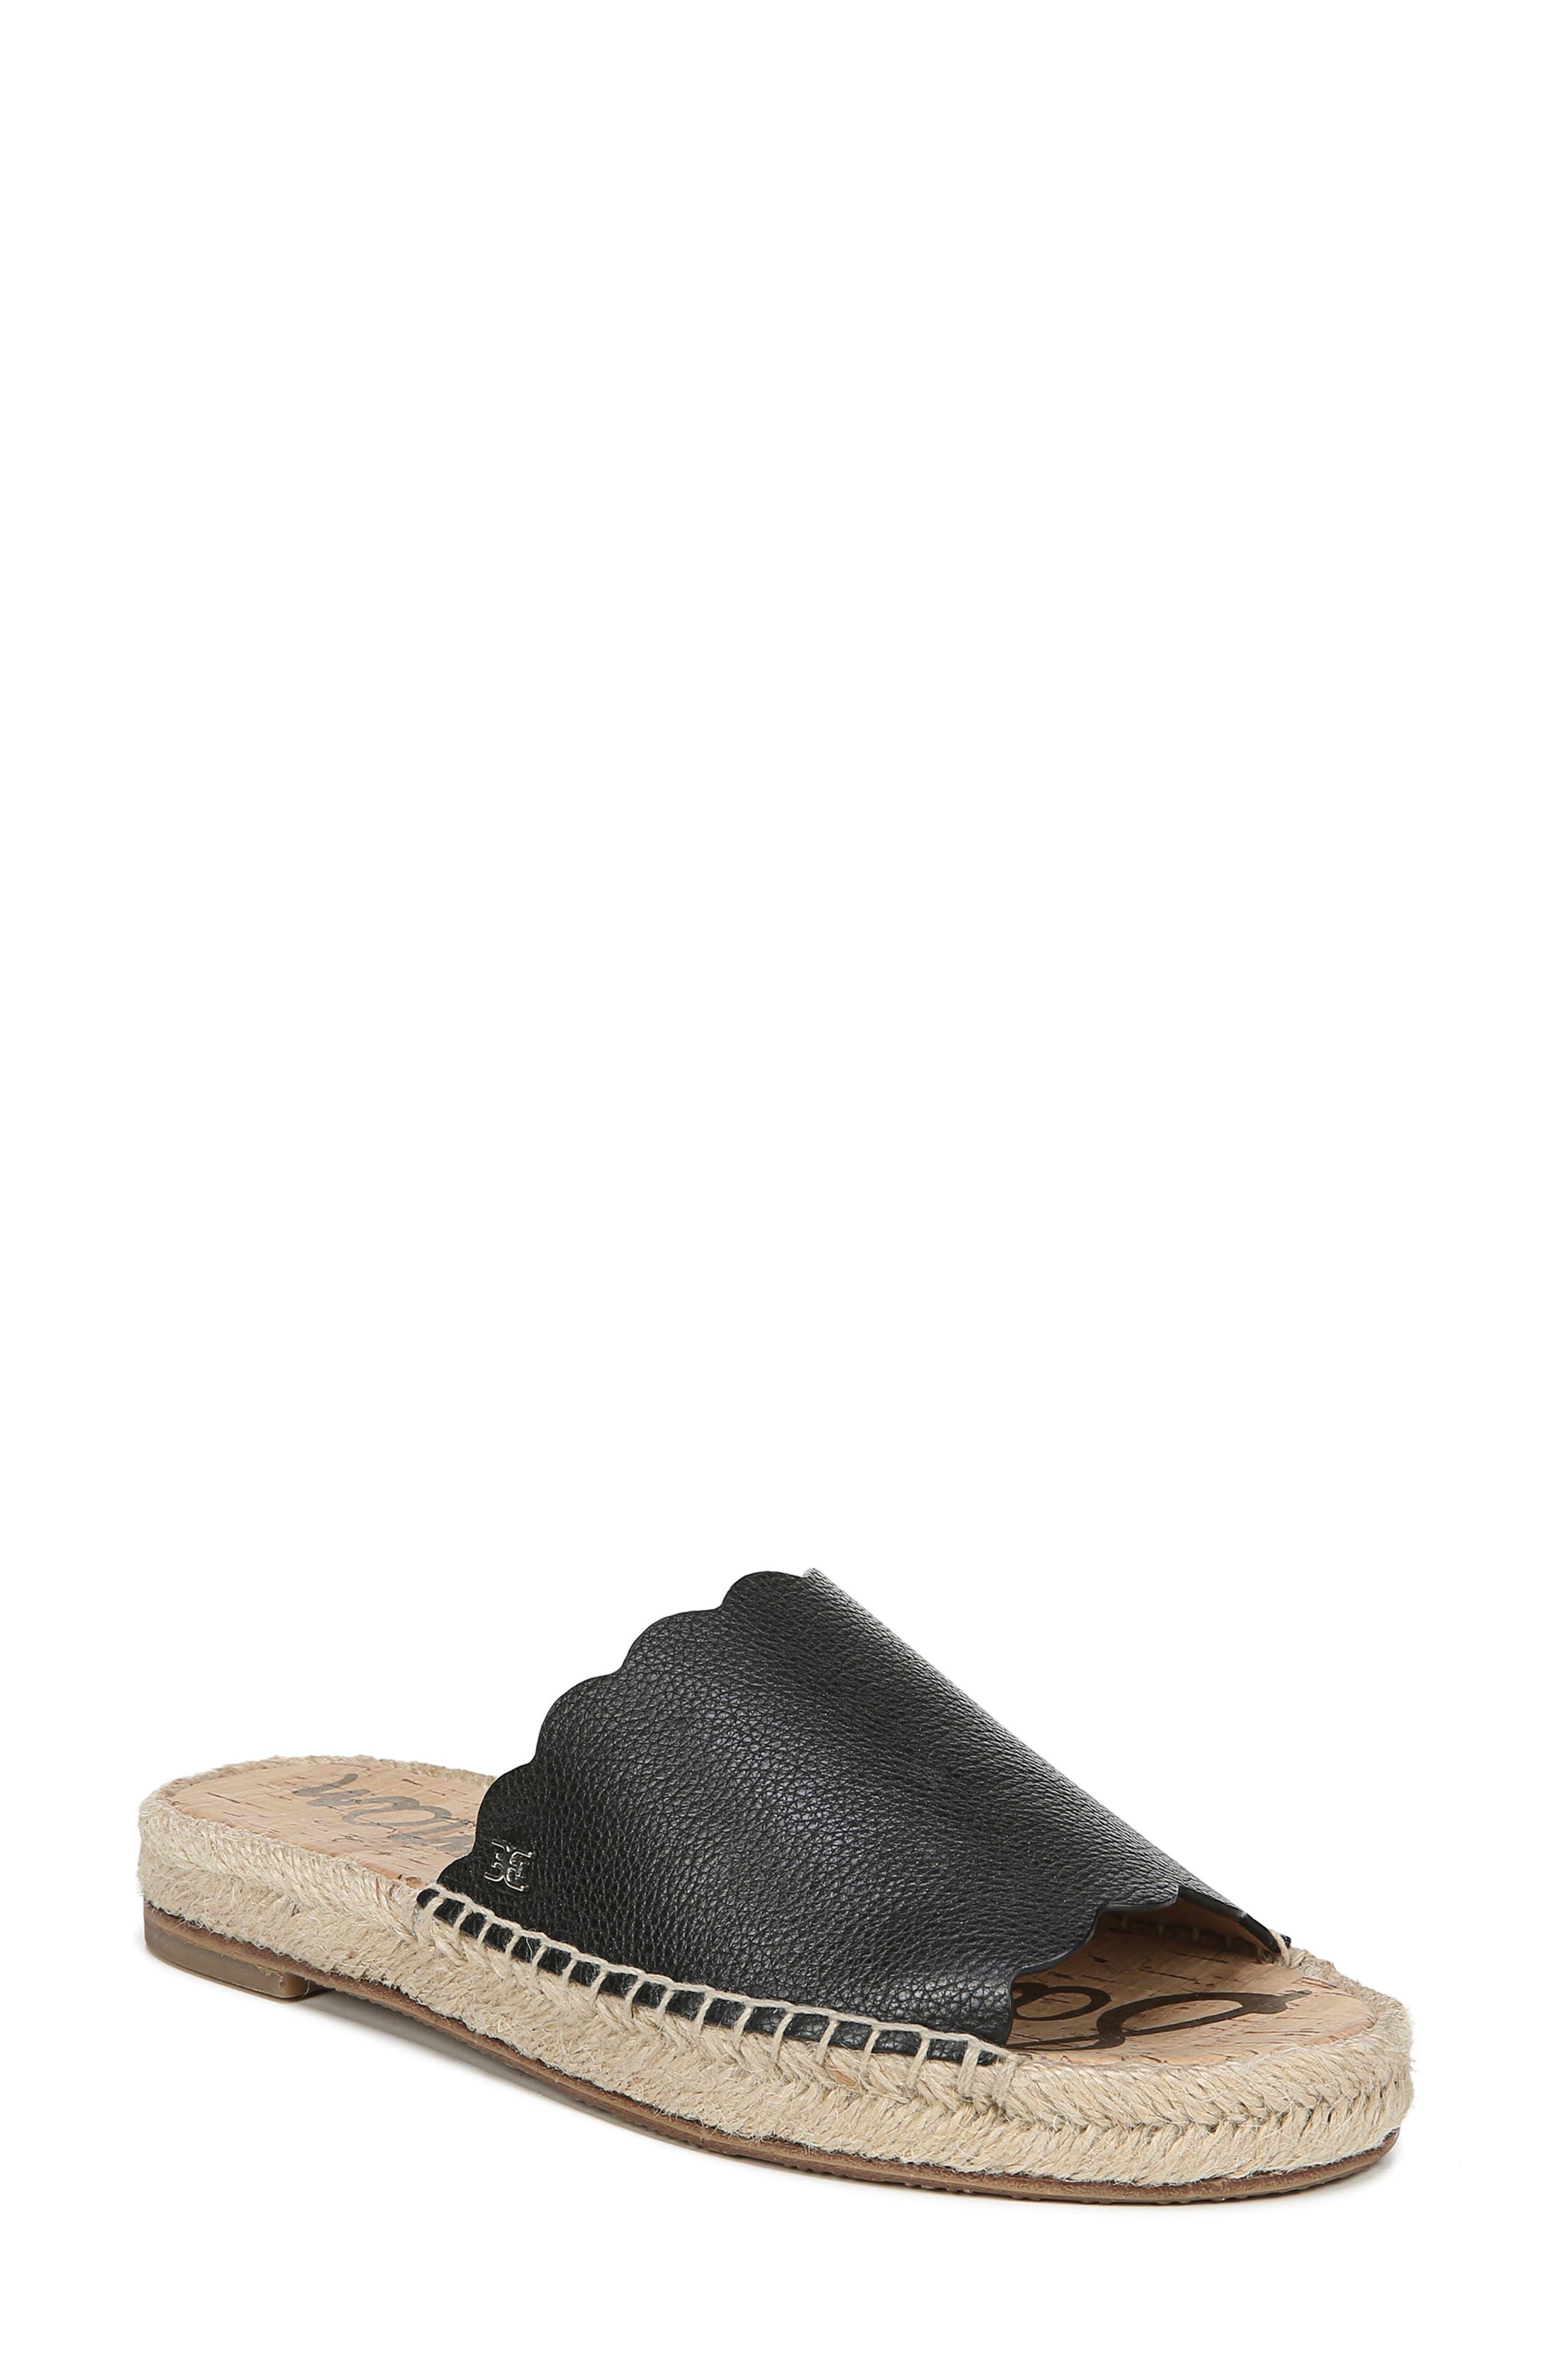 SAM EDELMAN Andy Slide Sandal, Main, color, BLACK